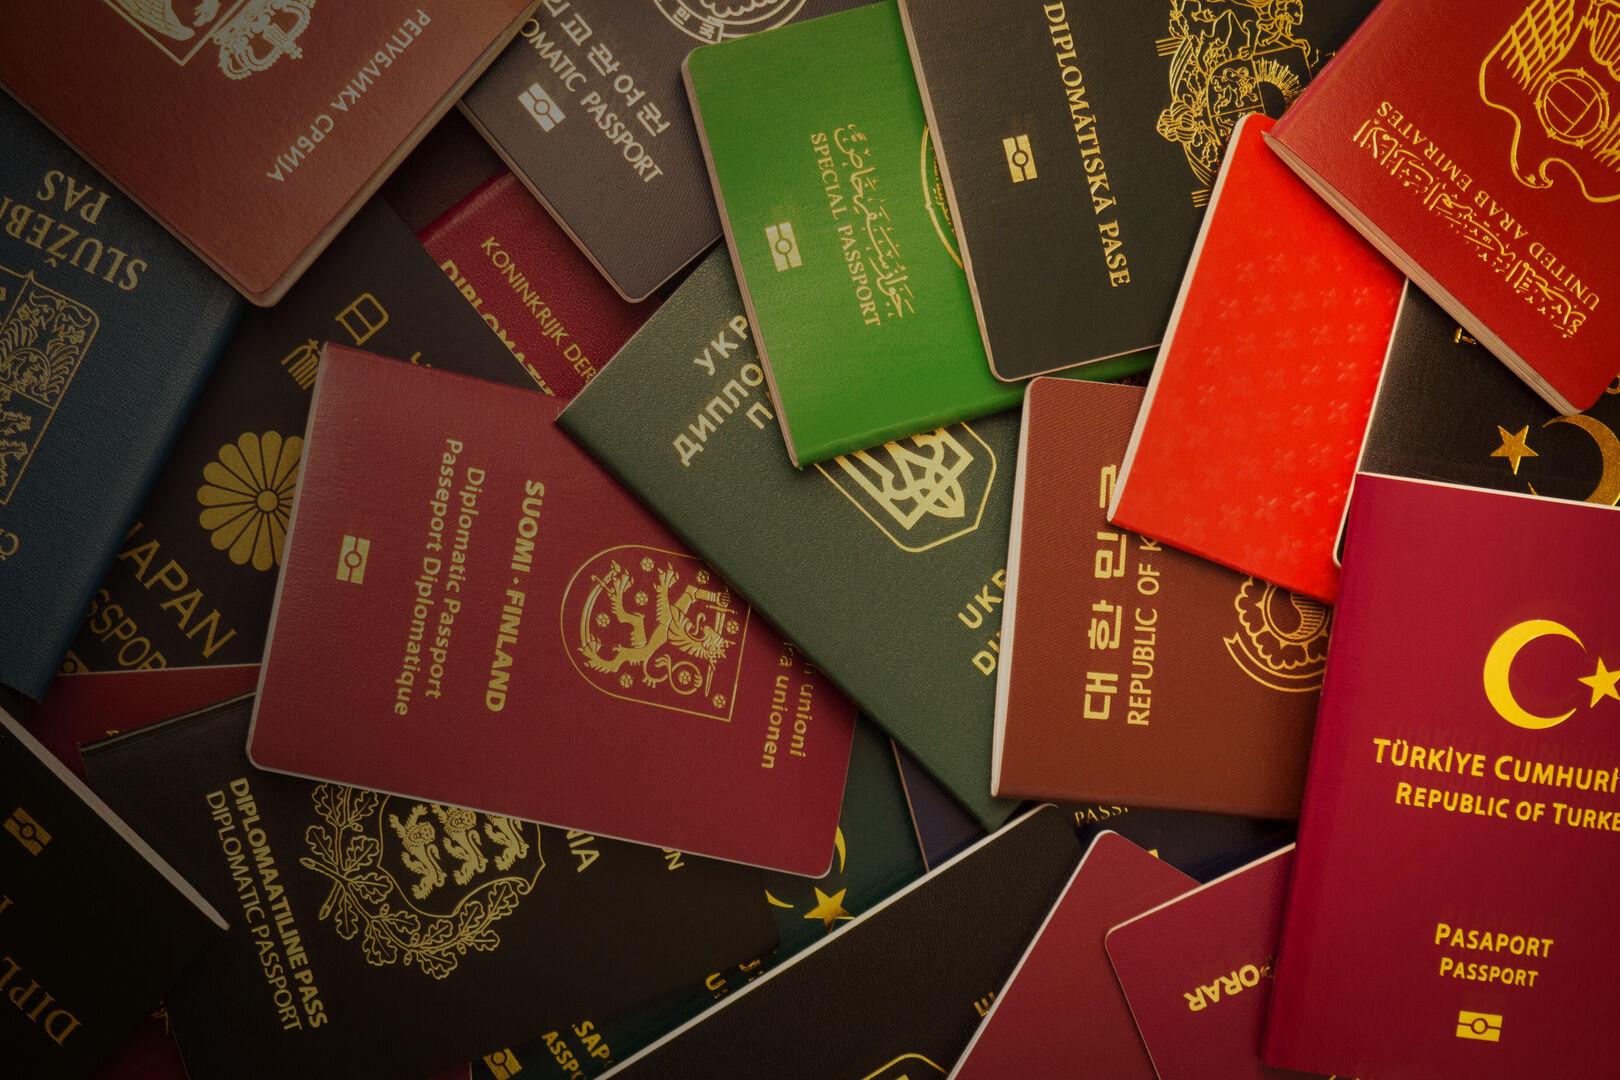 Verbod kopie paspoort